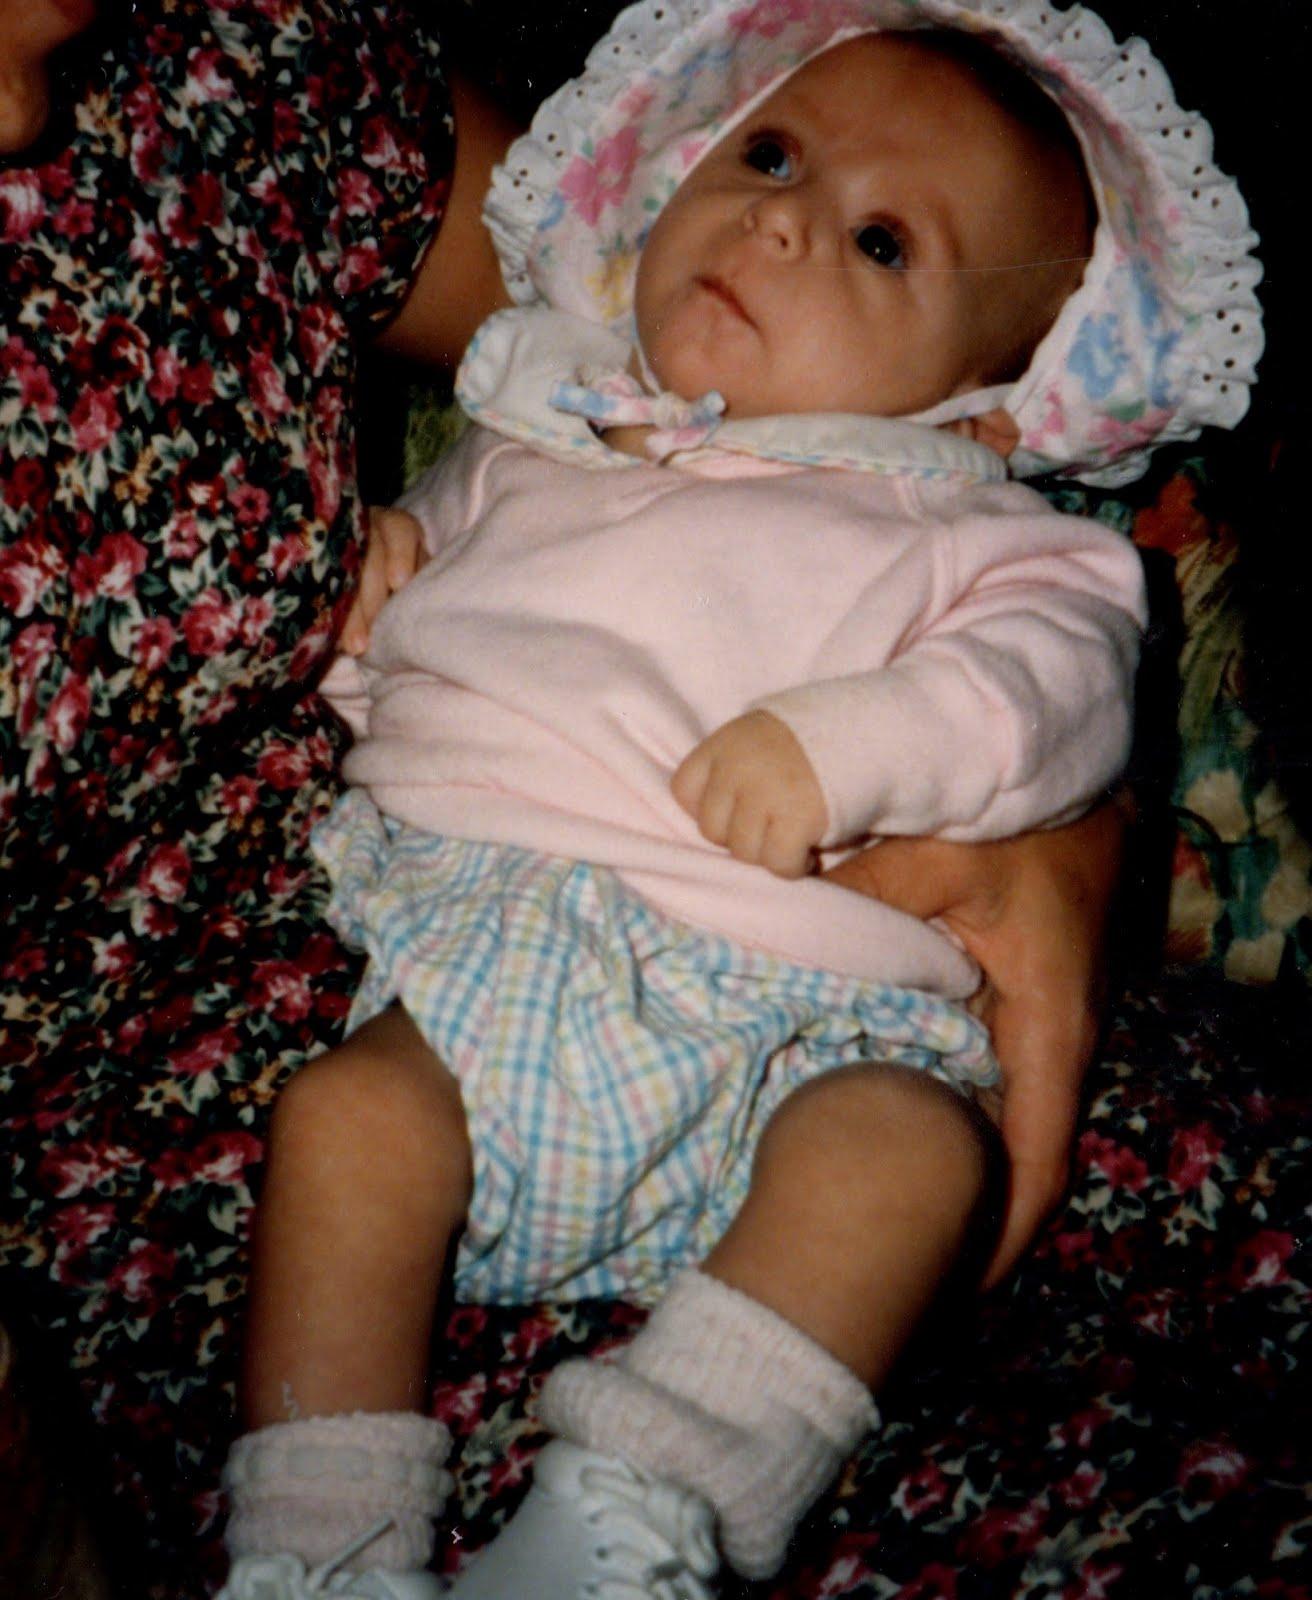 Baby Elisabeth